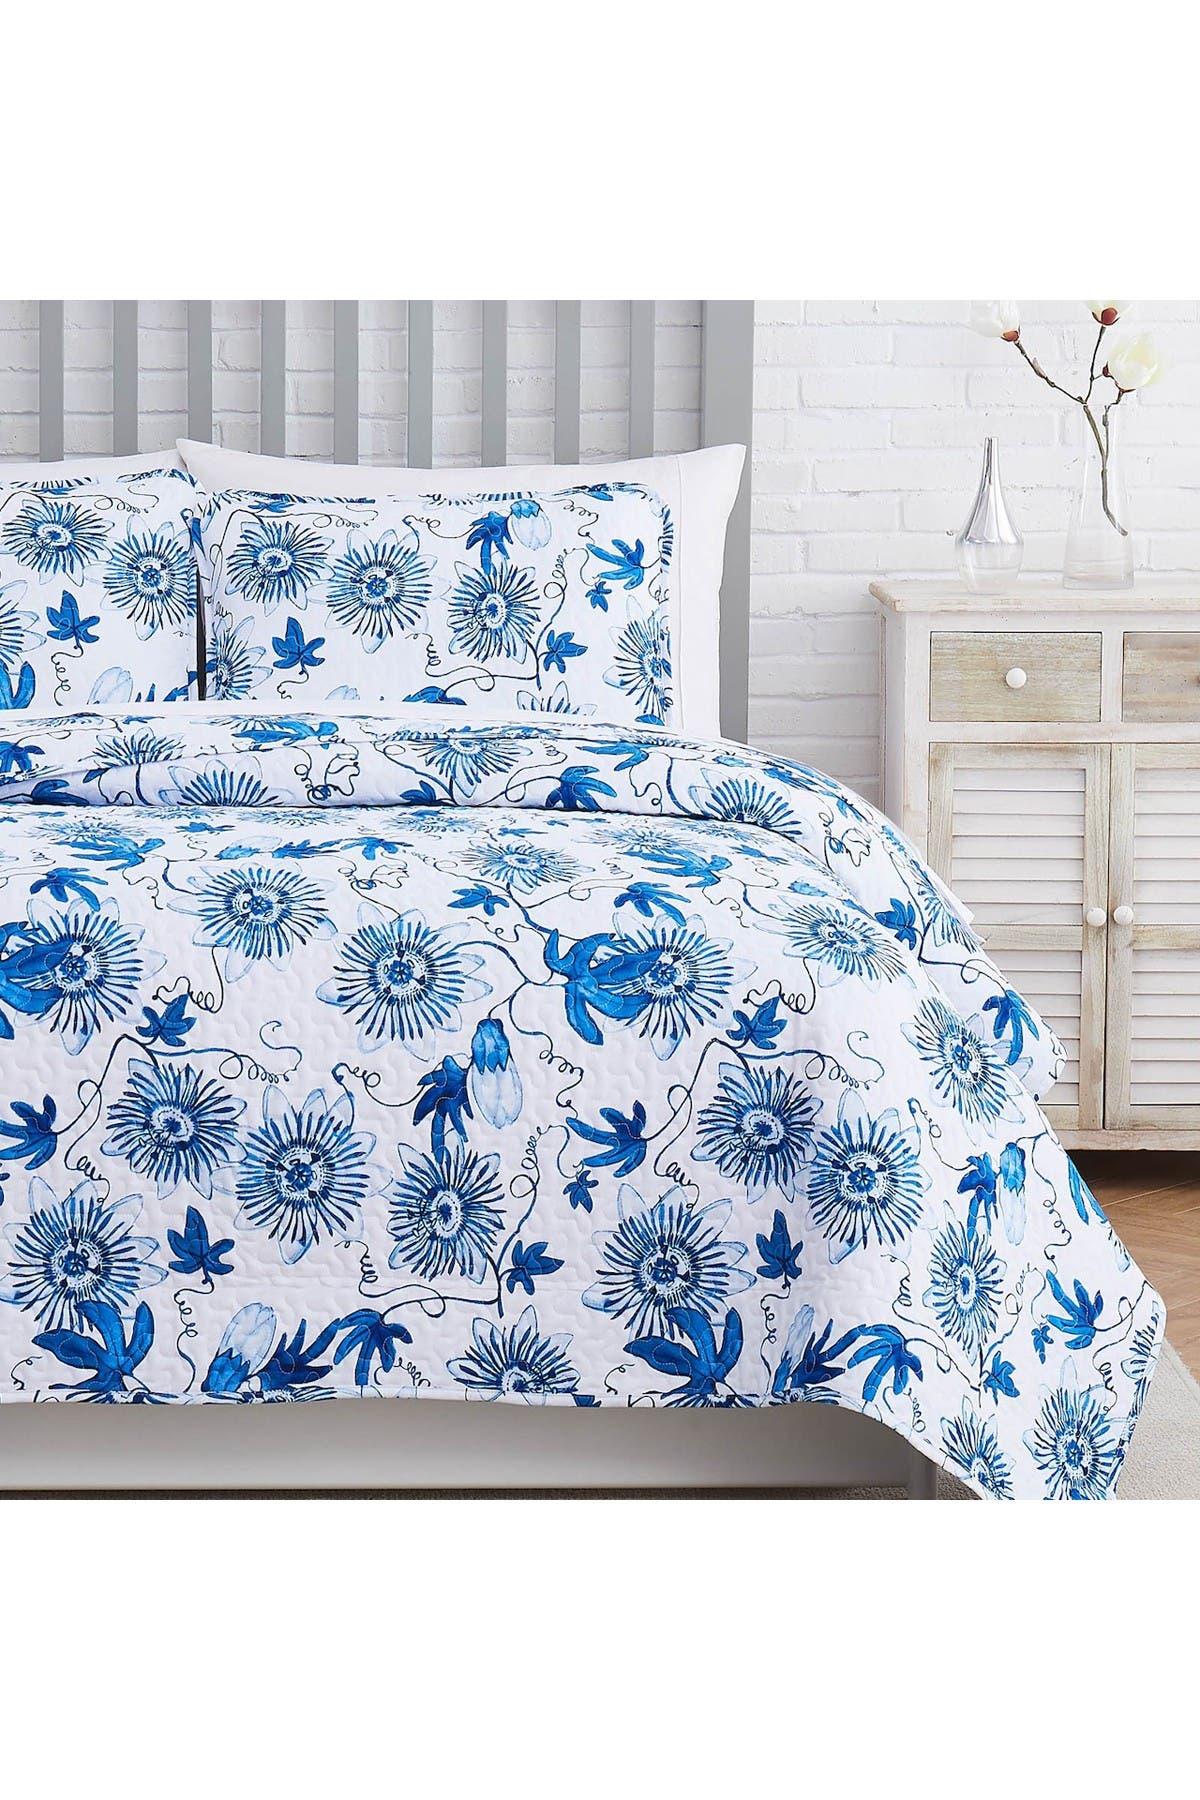 Image of SOUTHSHORE FINE LINENS Floral Joy Oversized Quilt Cover Set - Blue - King/California King